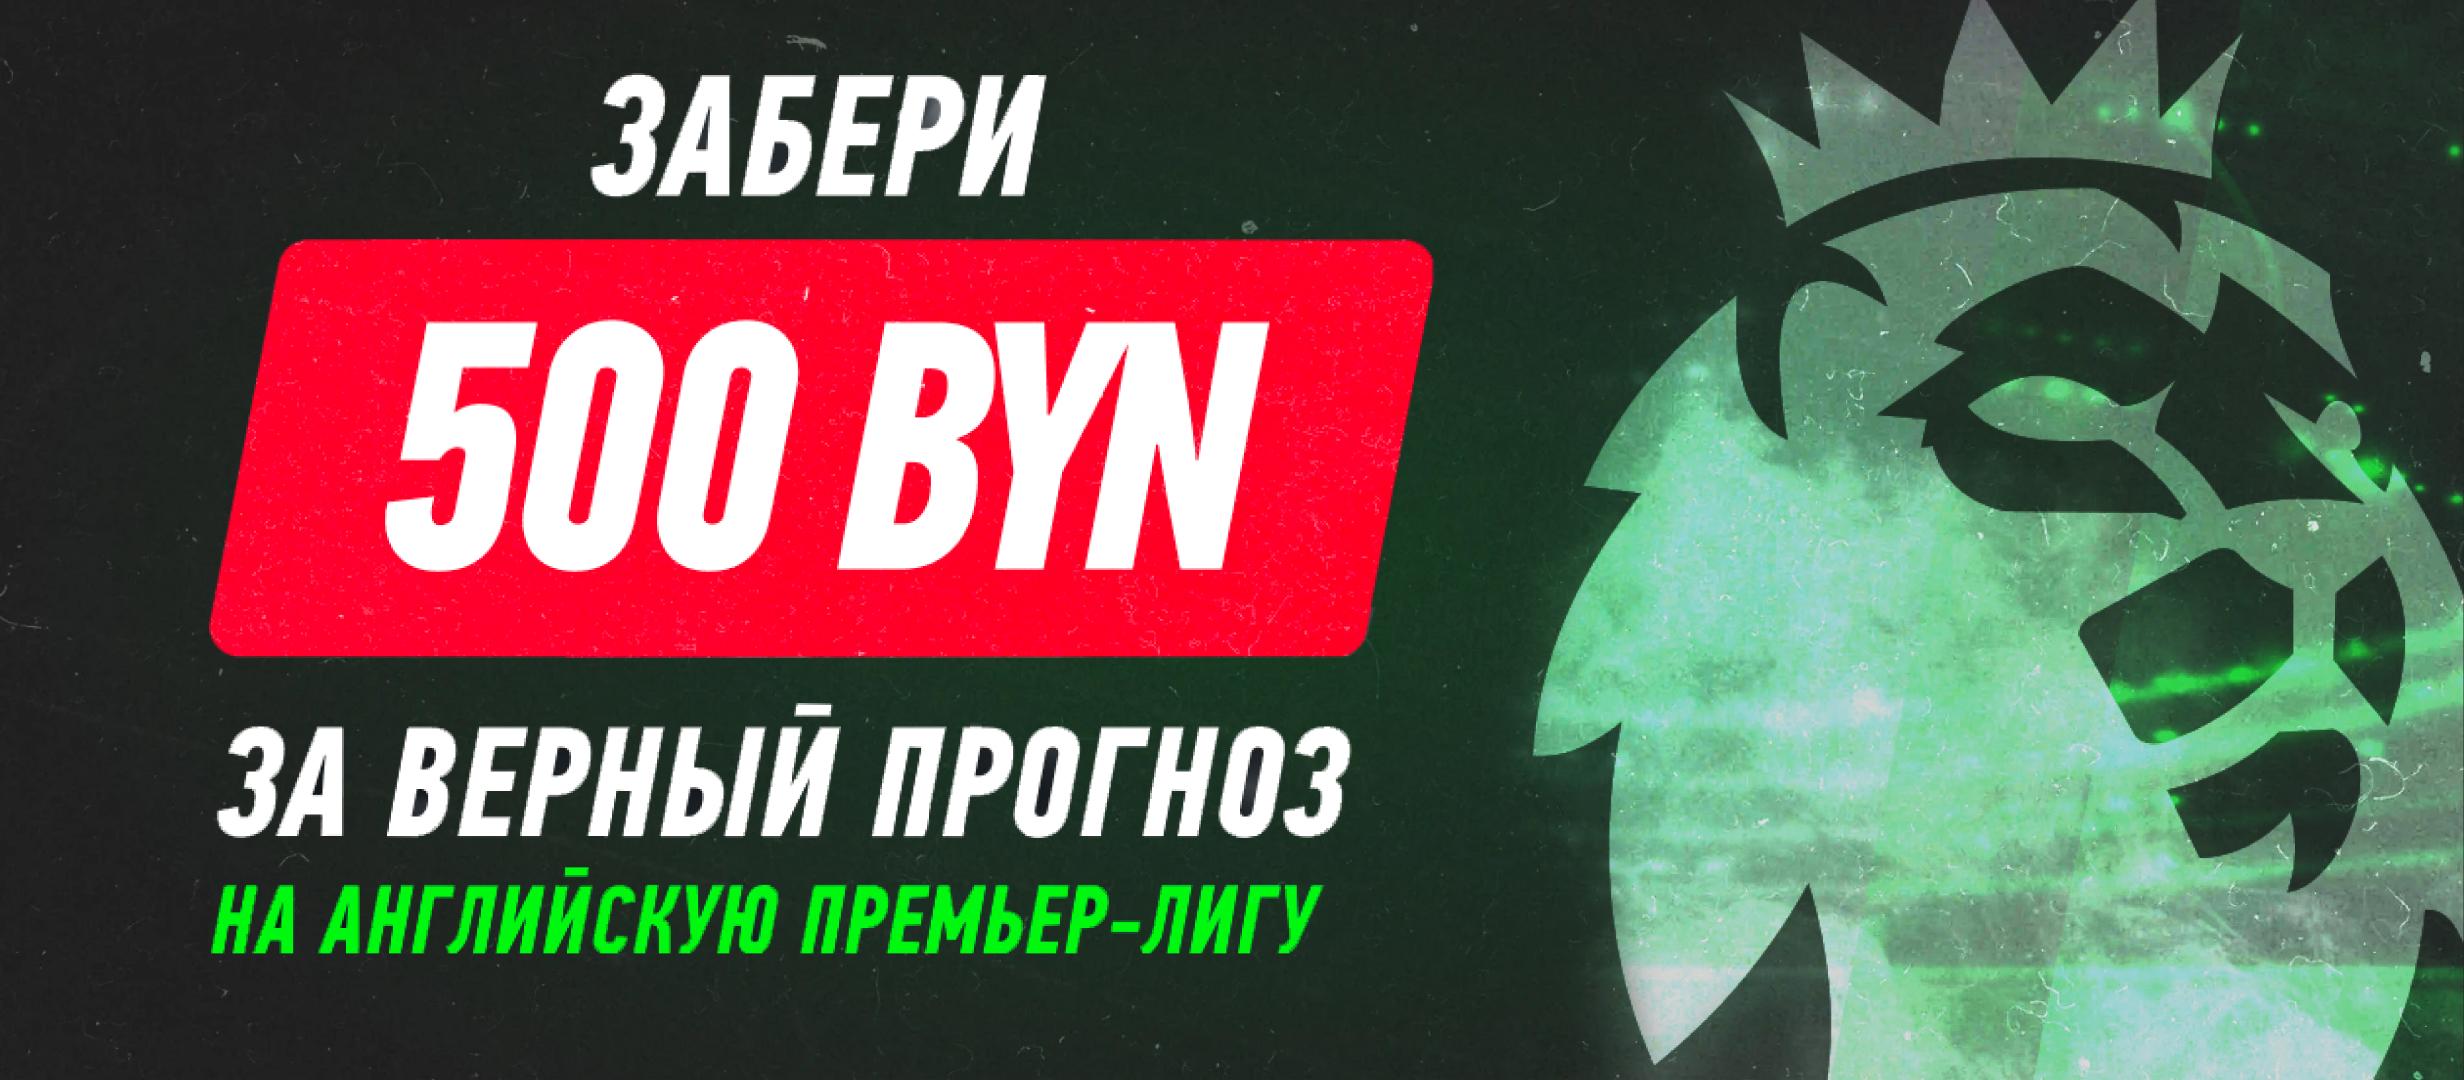 Кеш-бонус от Maxline 500 руб..